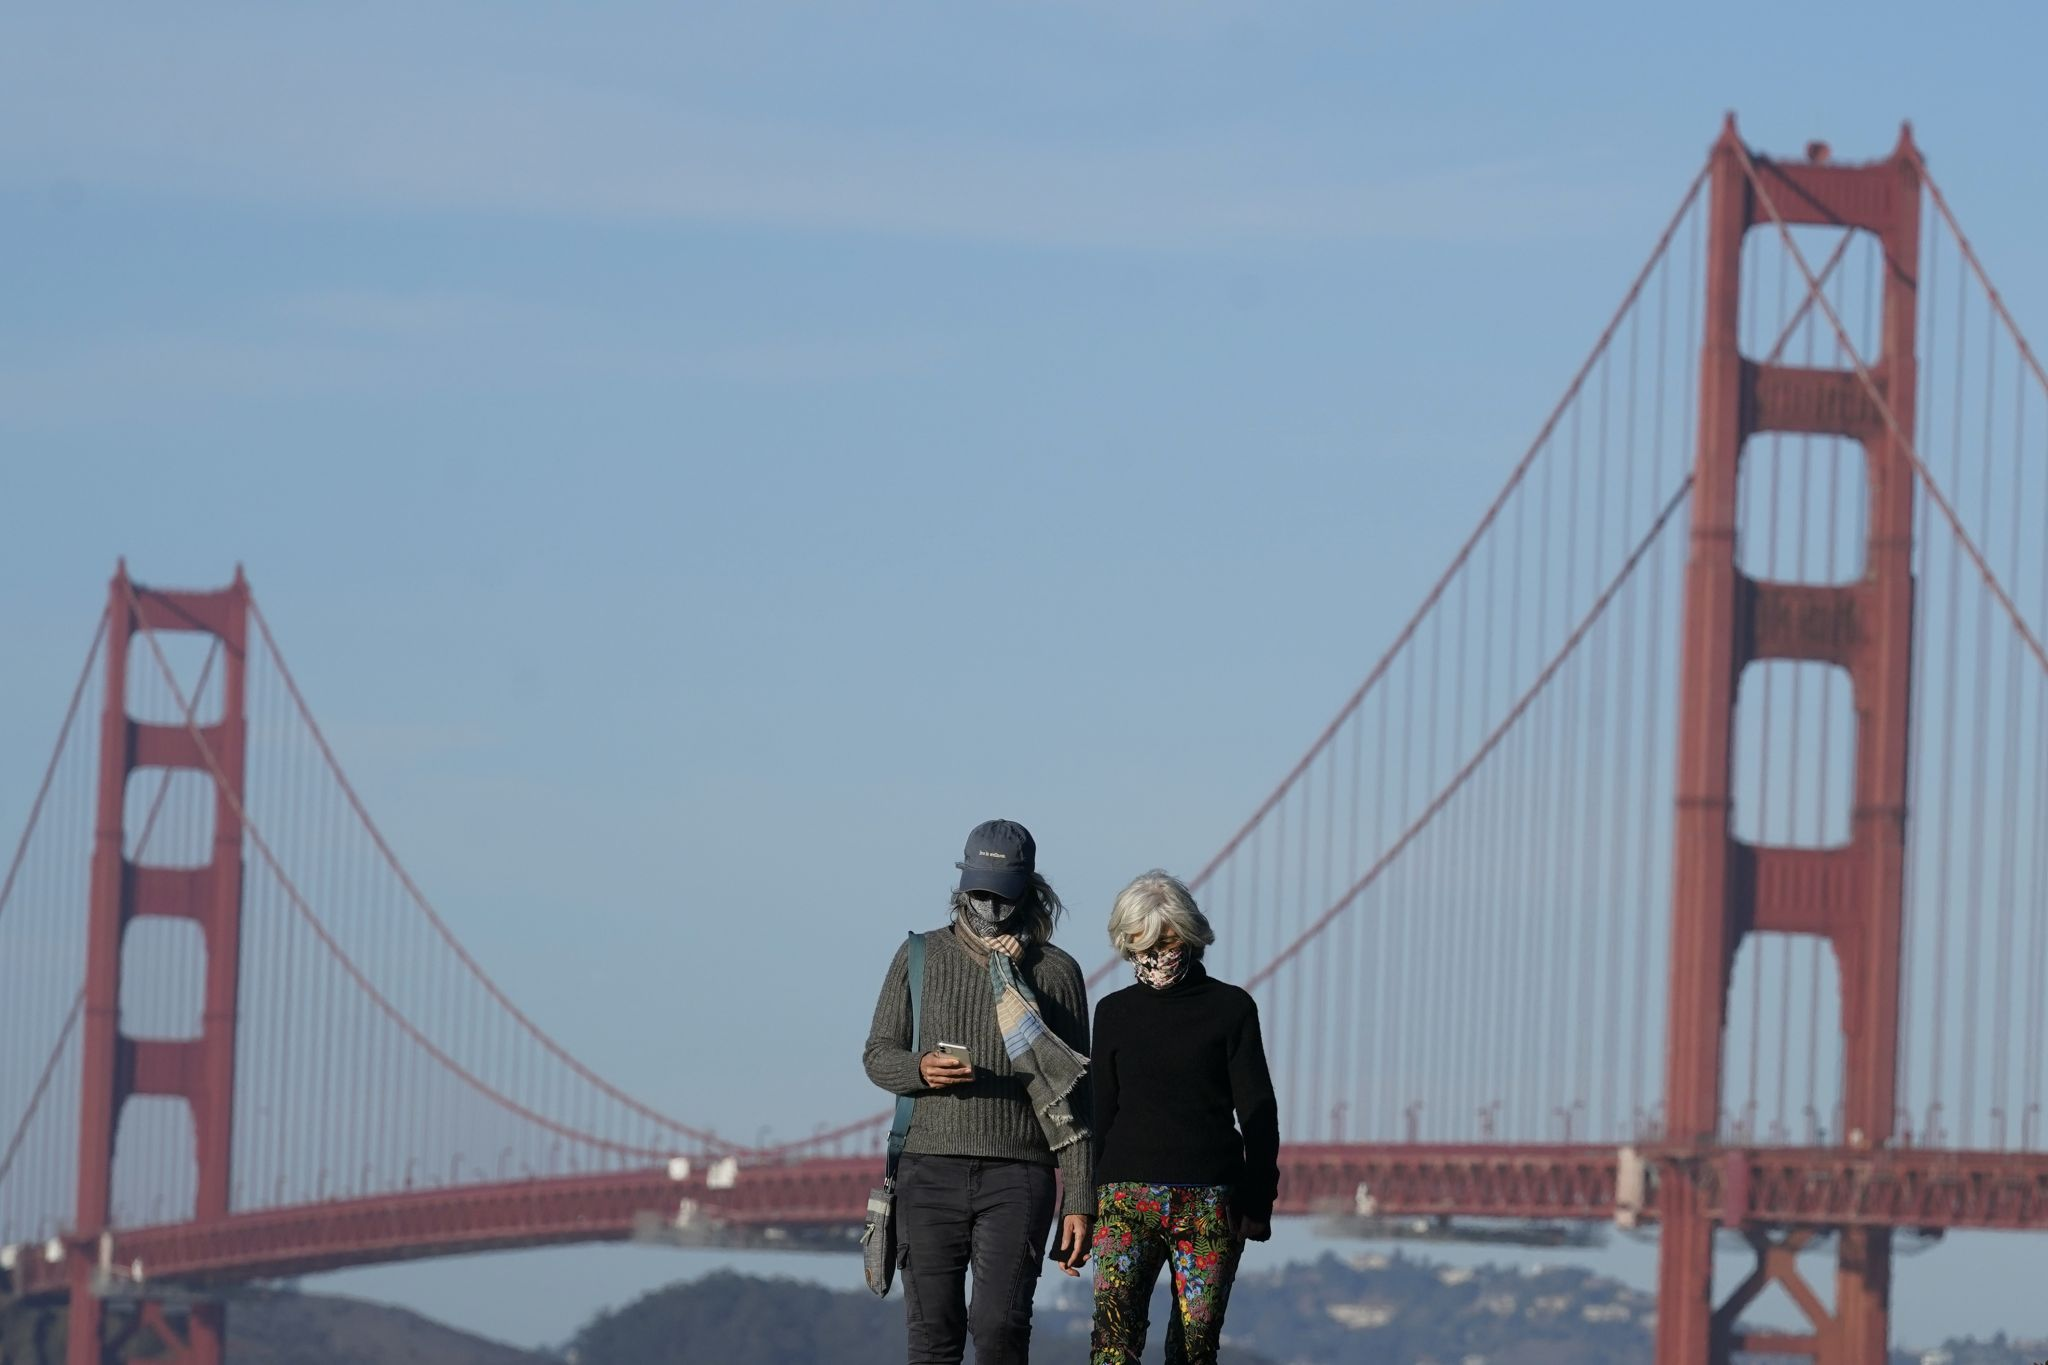 Has San Francisco reached its COVID peak?